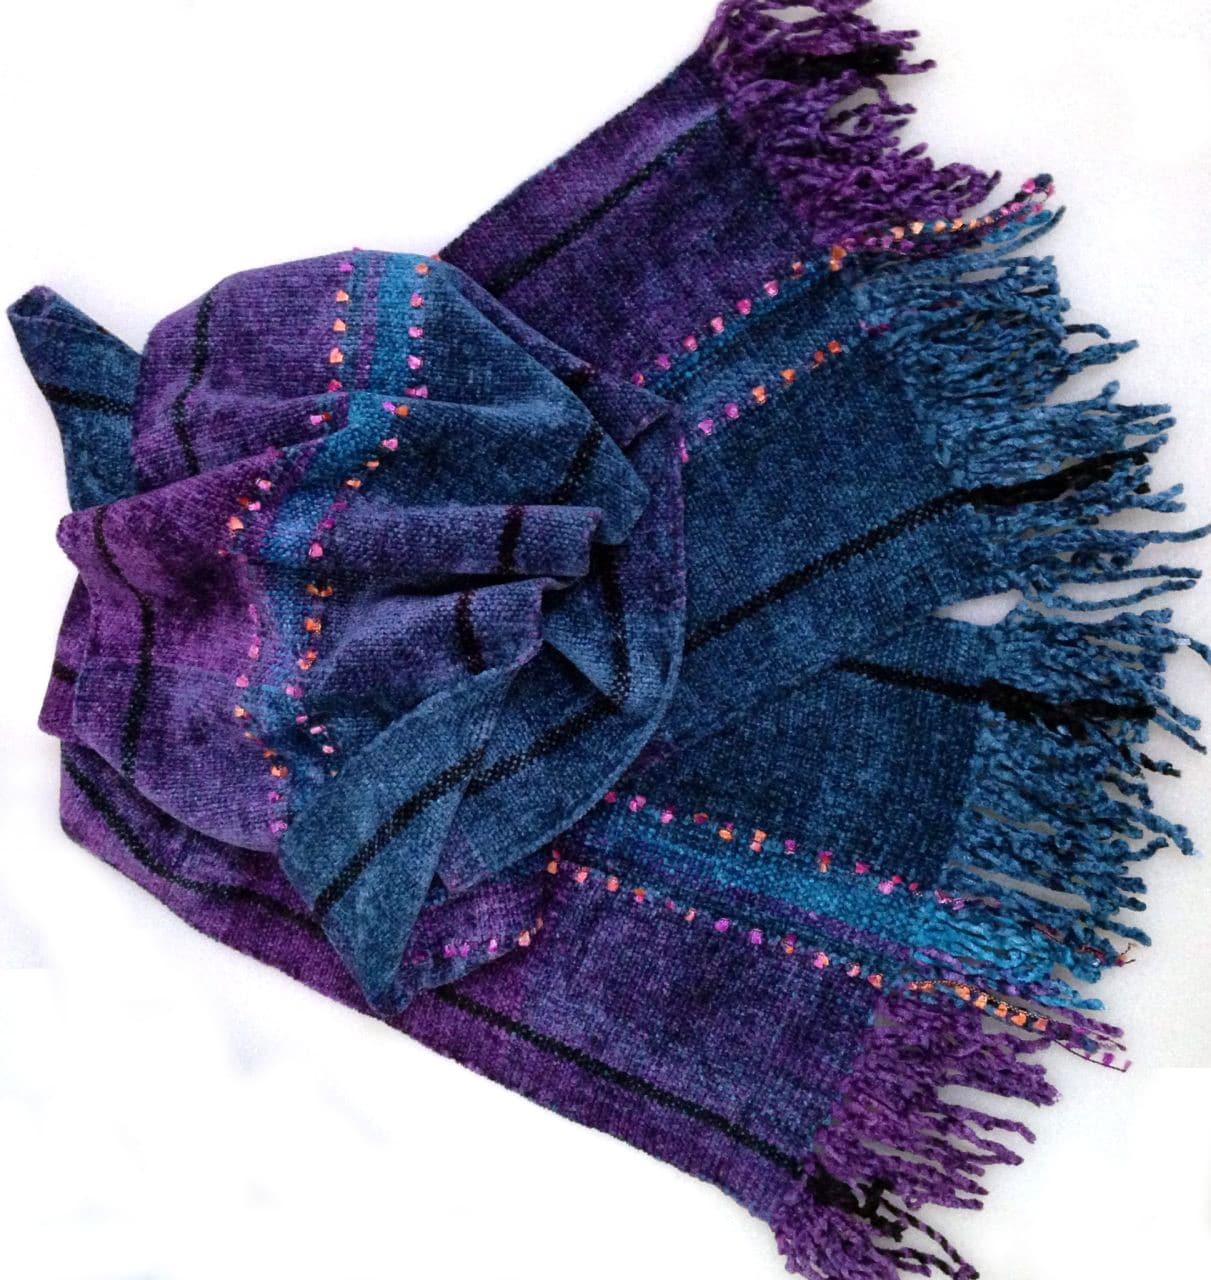 Purple, Blue, Black with Ornamental Yarn - Bamboo Chenille Handwoven Scarf 8 x 68